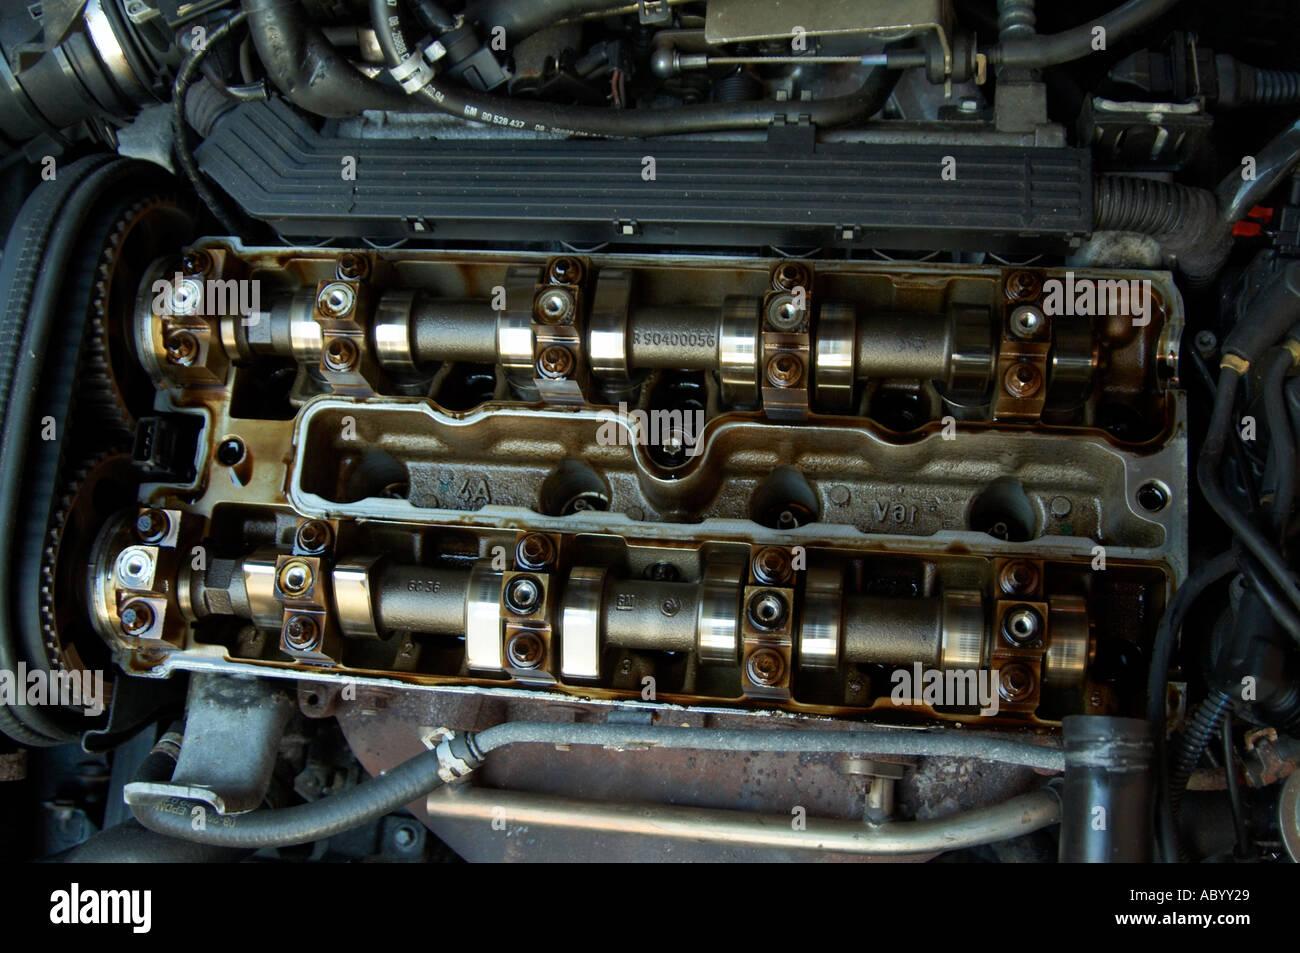 diy engine lift